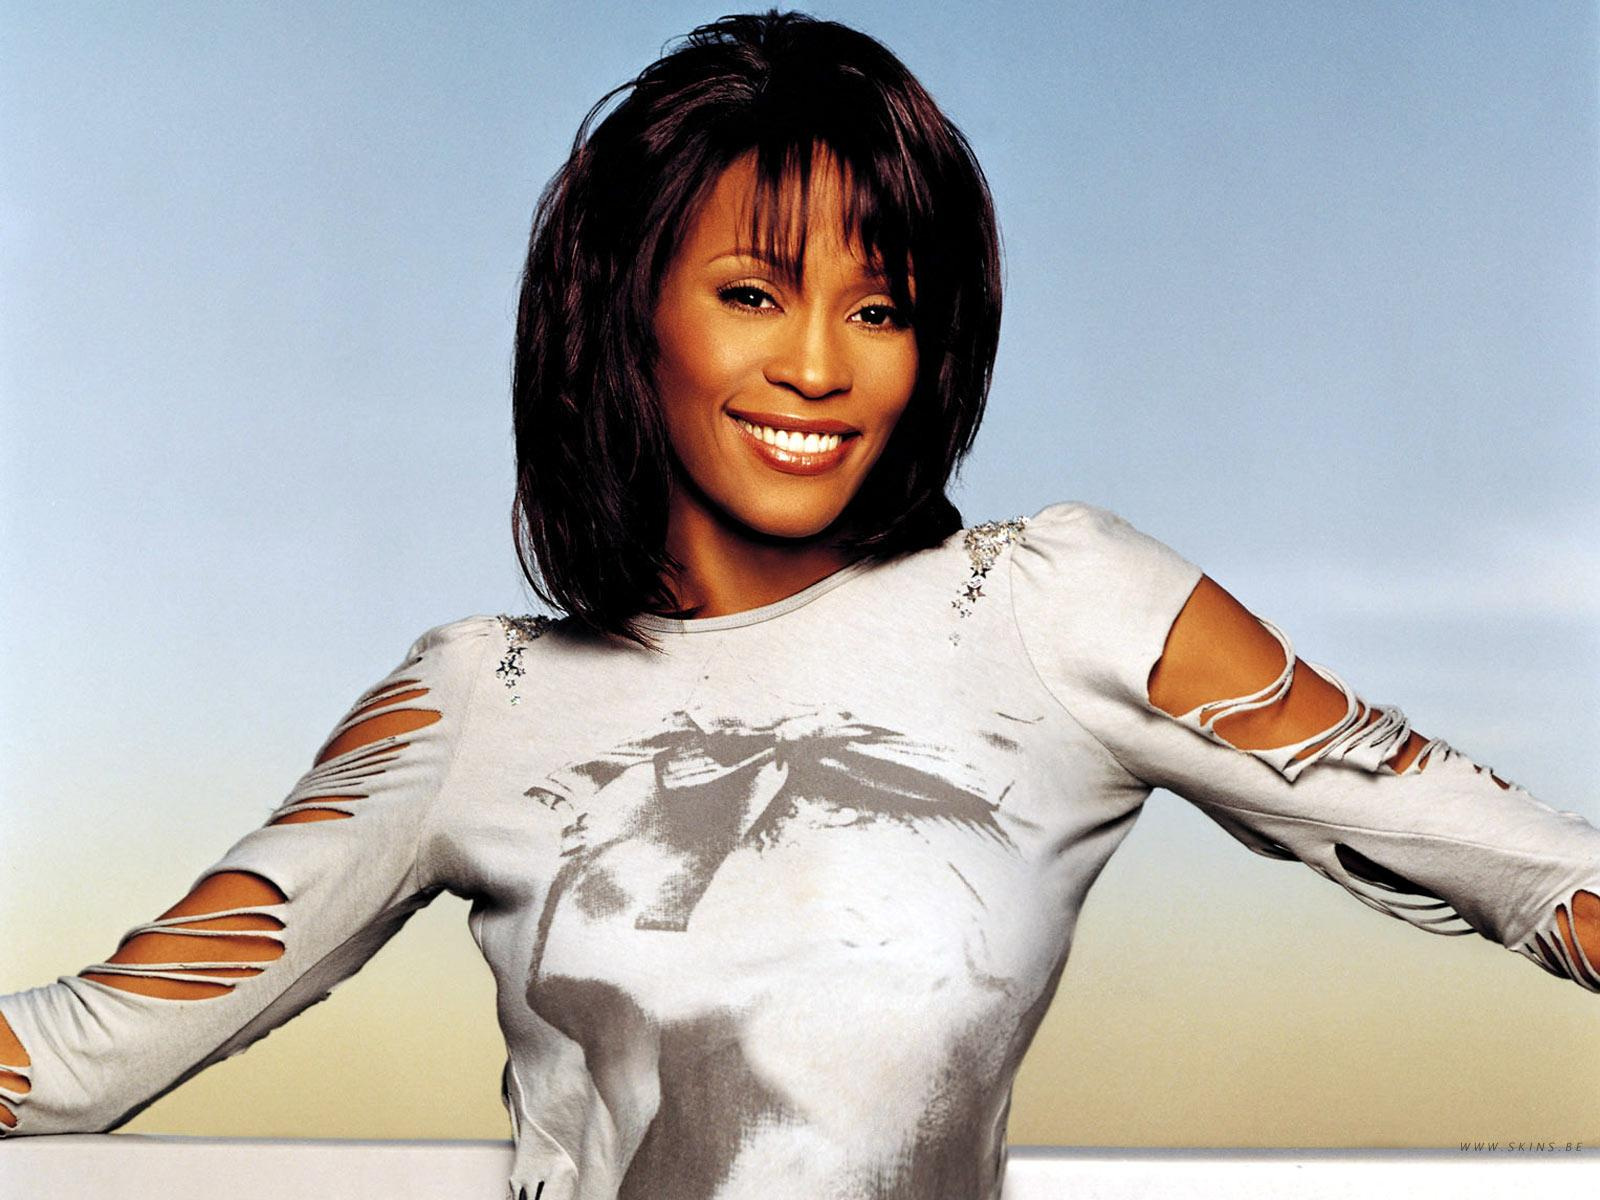 Whitney Houston One Of Those Days music video photo shoot